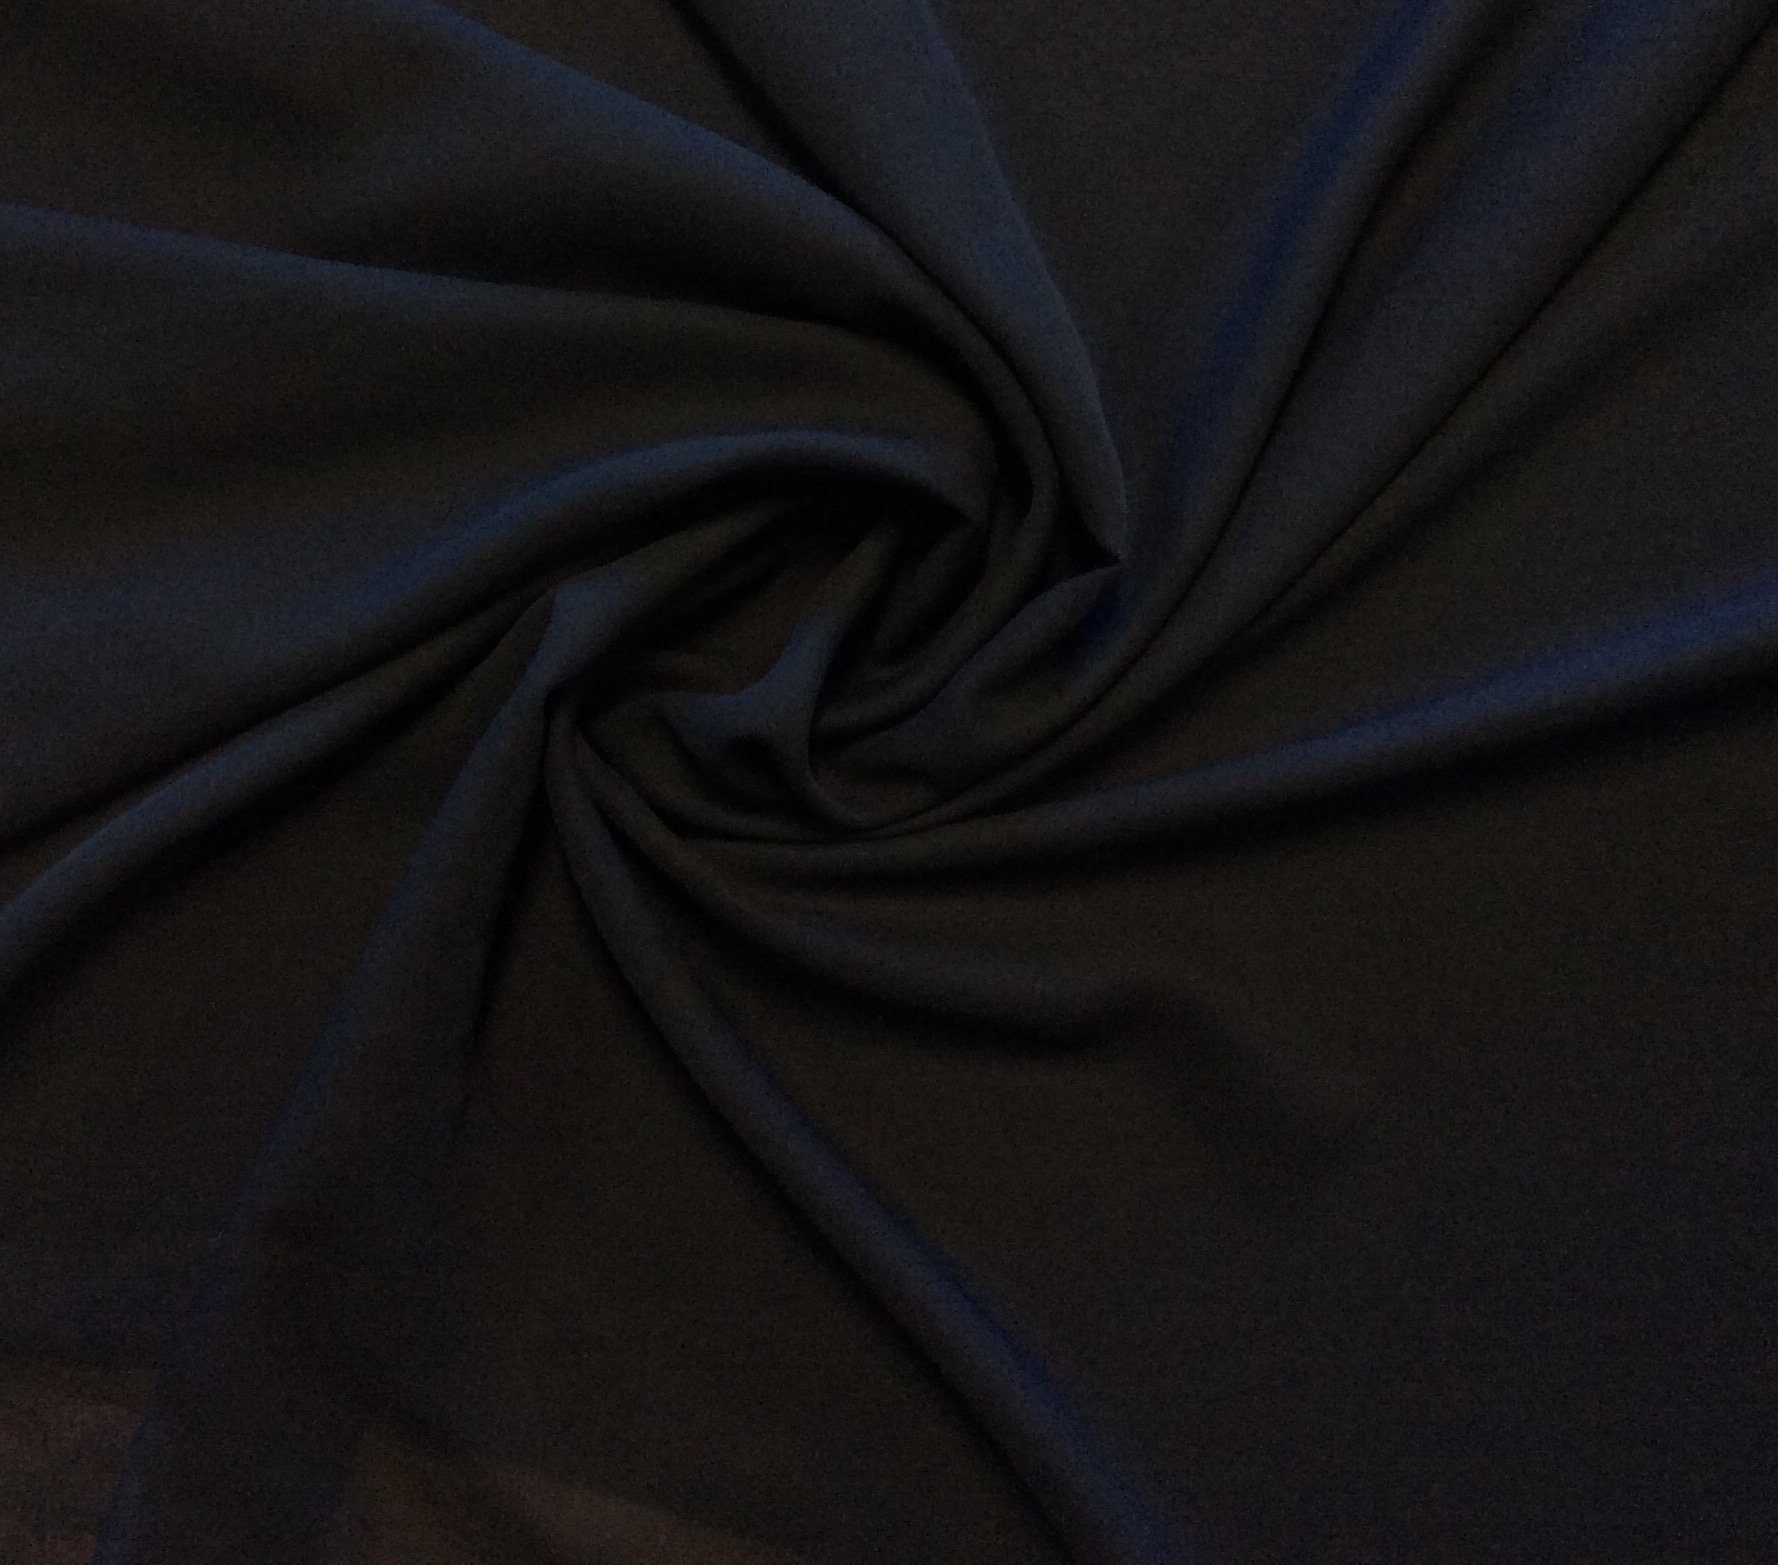 Navy Blue Midnight Polyester Georgette Semi Sheer Apparel Dress Fabric FMT19